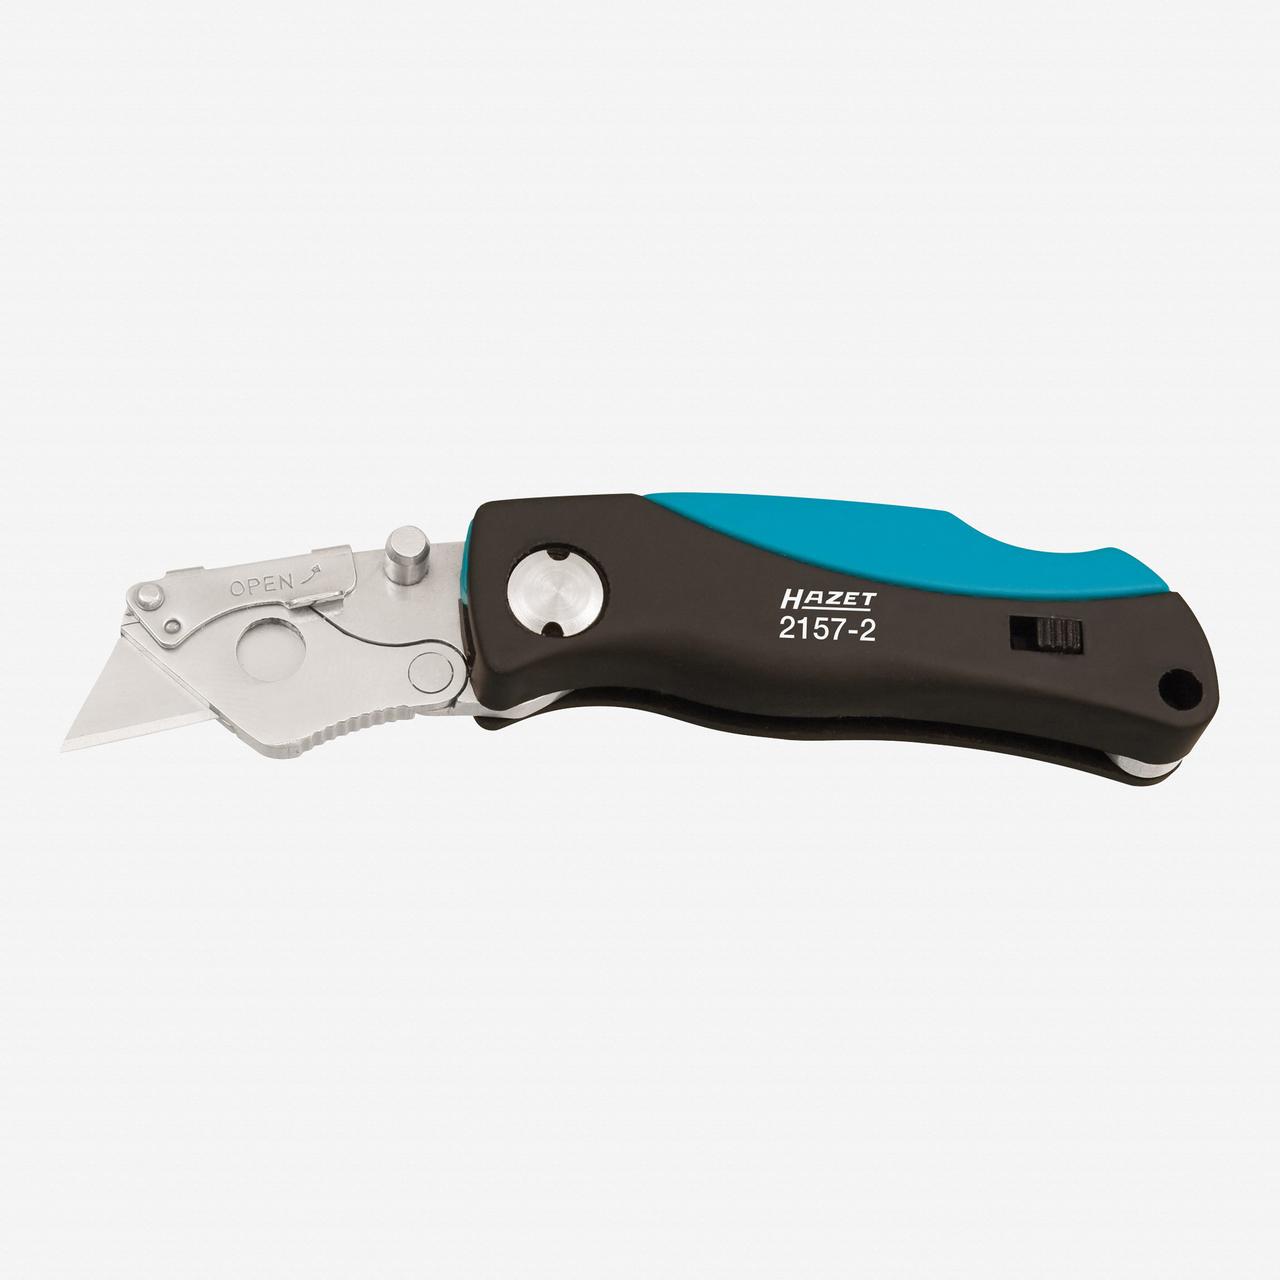 Hazet 2157-2 Mini utility knife  - KC Tool